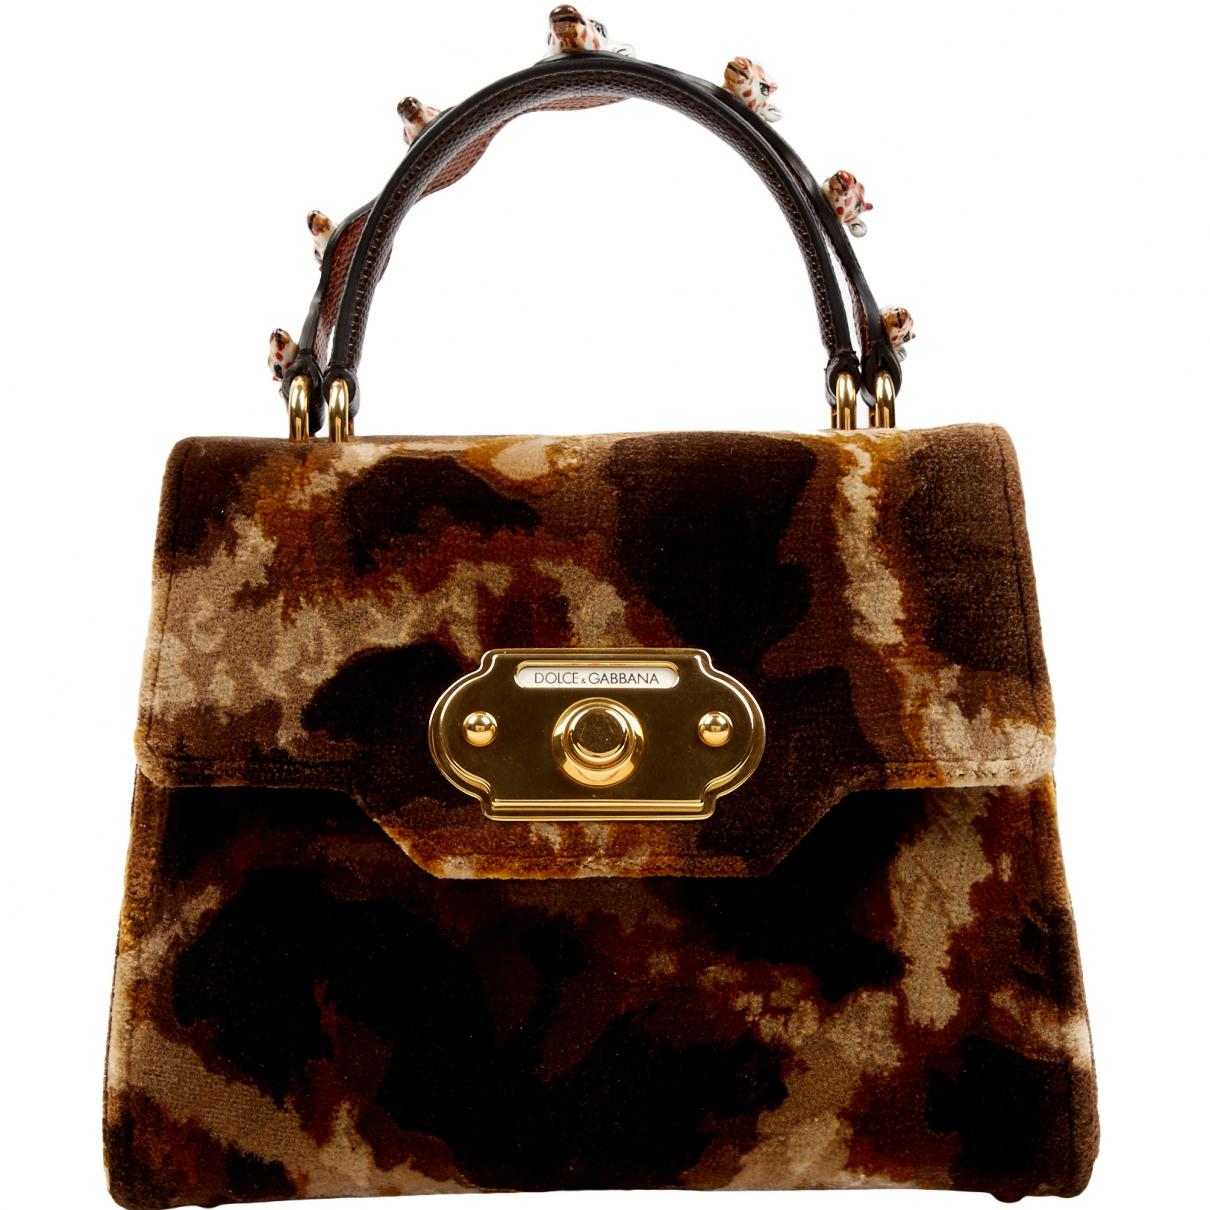 Dolce & Gabbana - Sac a main Welcome pour femme en velours - marron